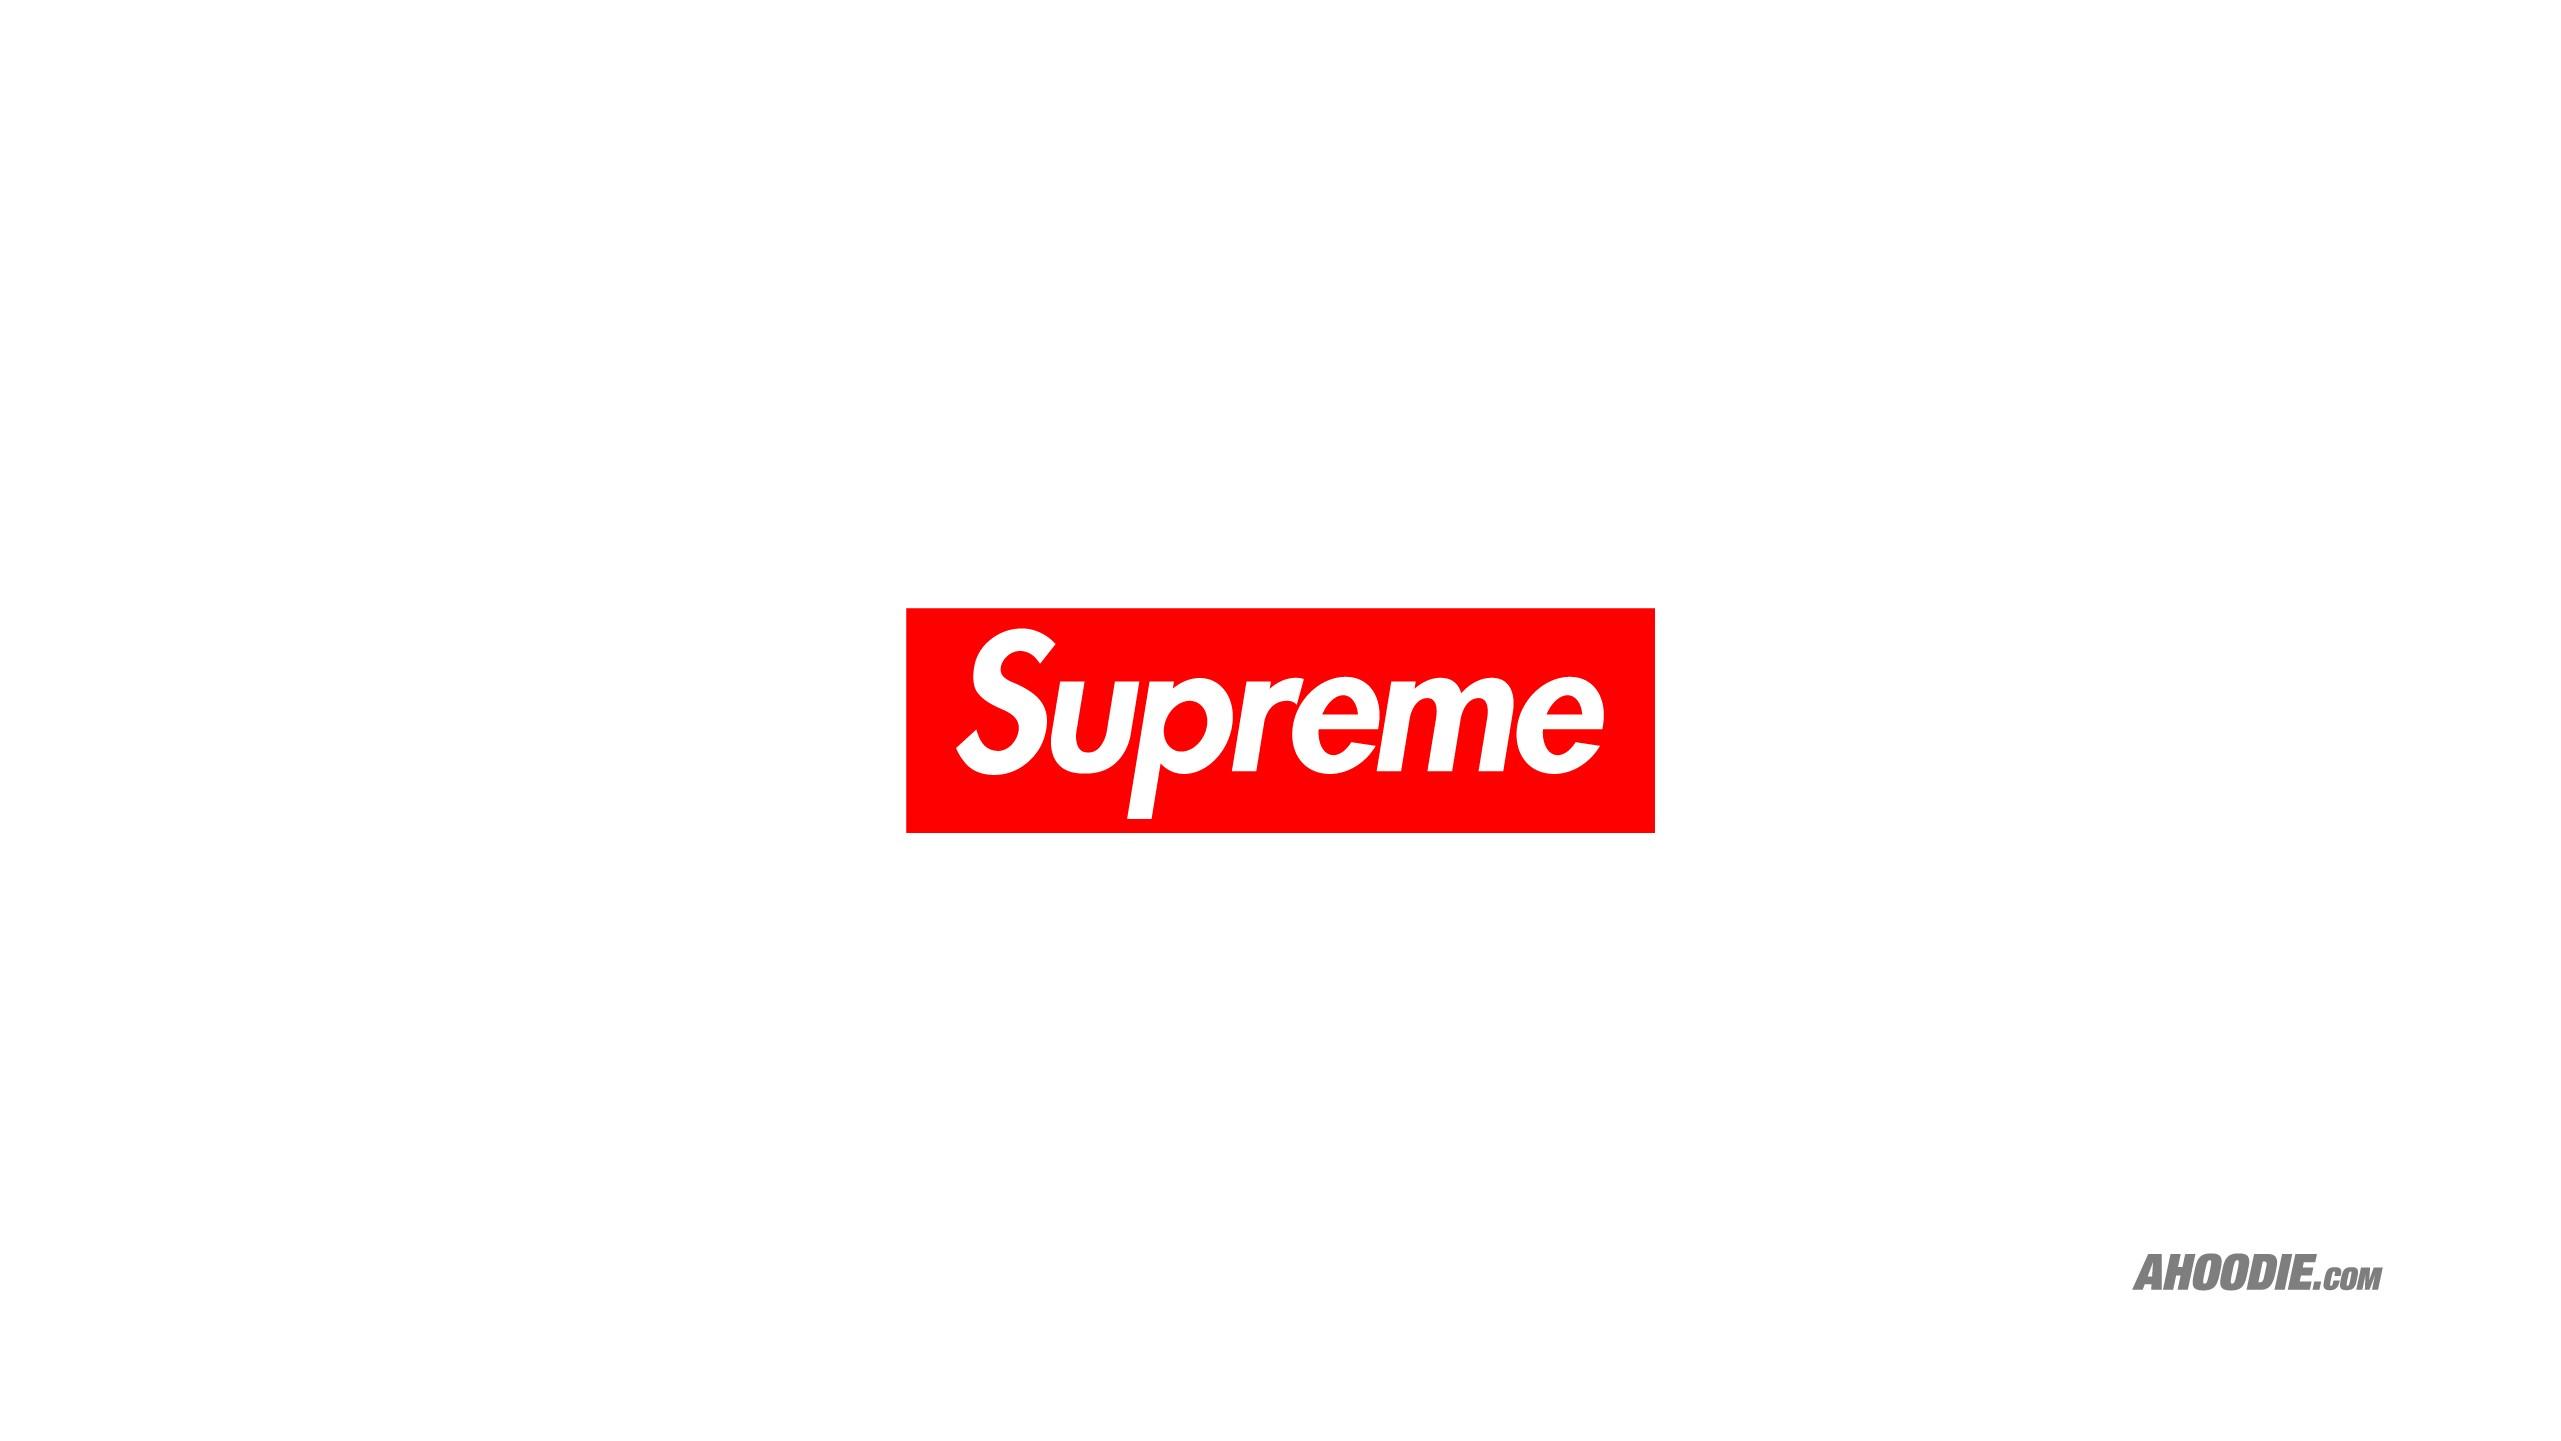 supreme - photo #30